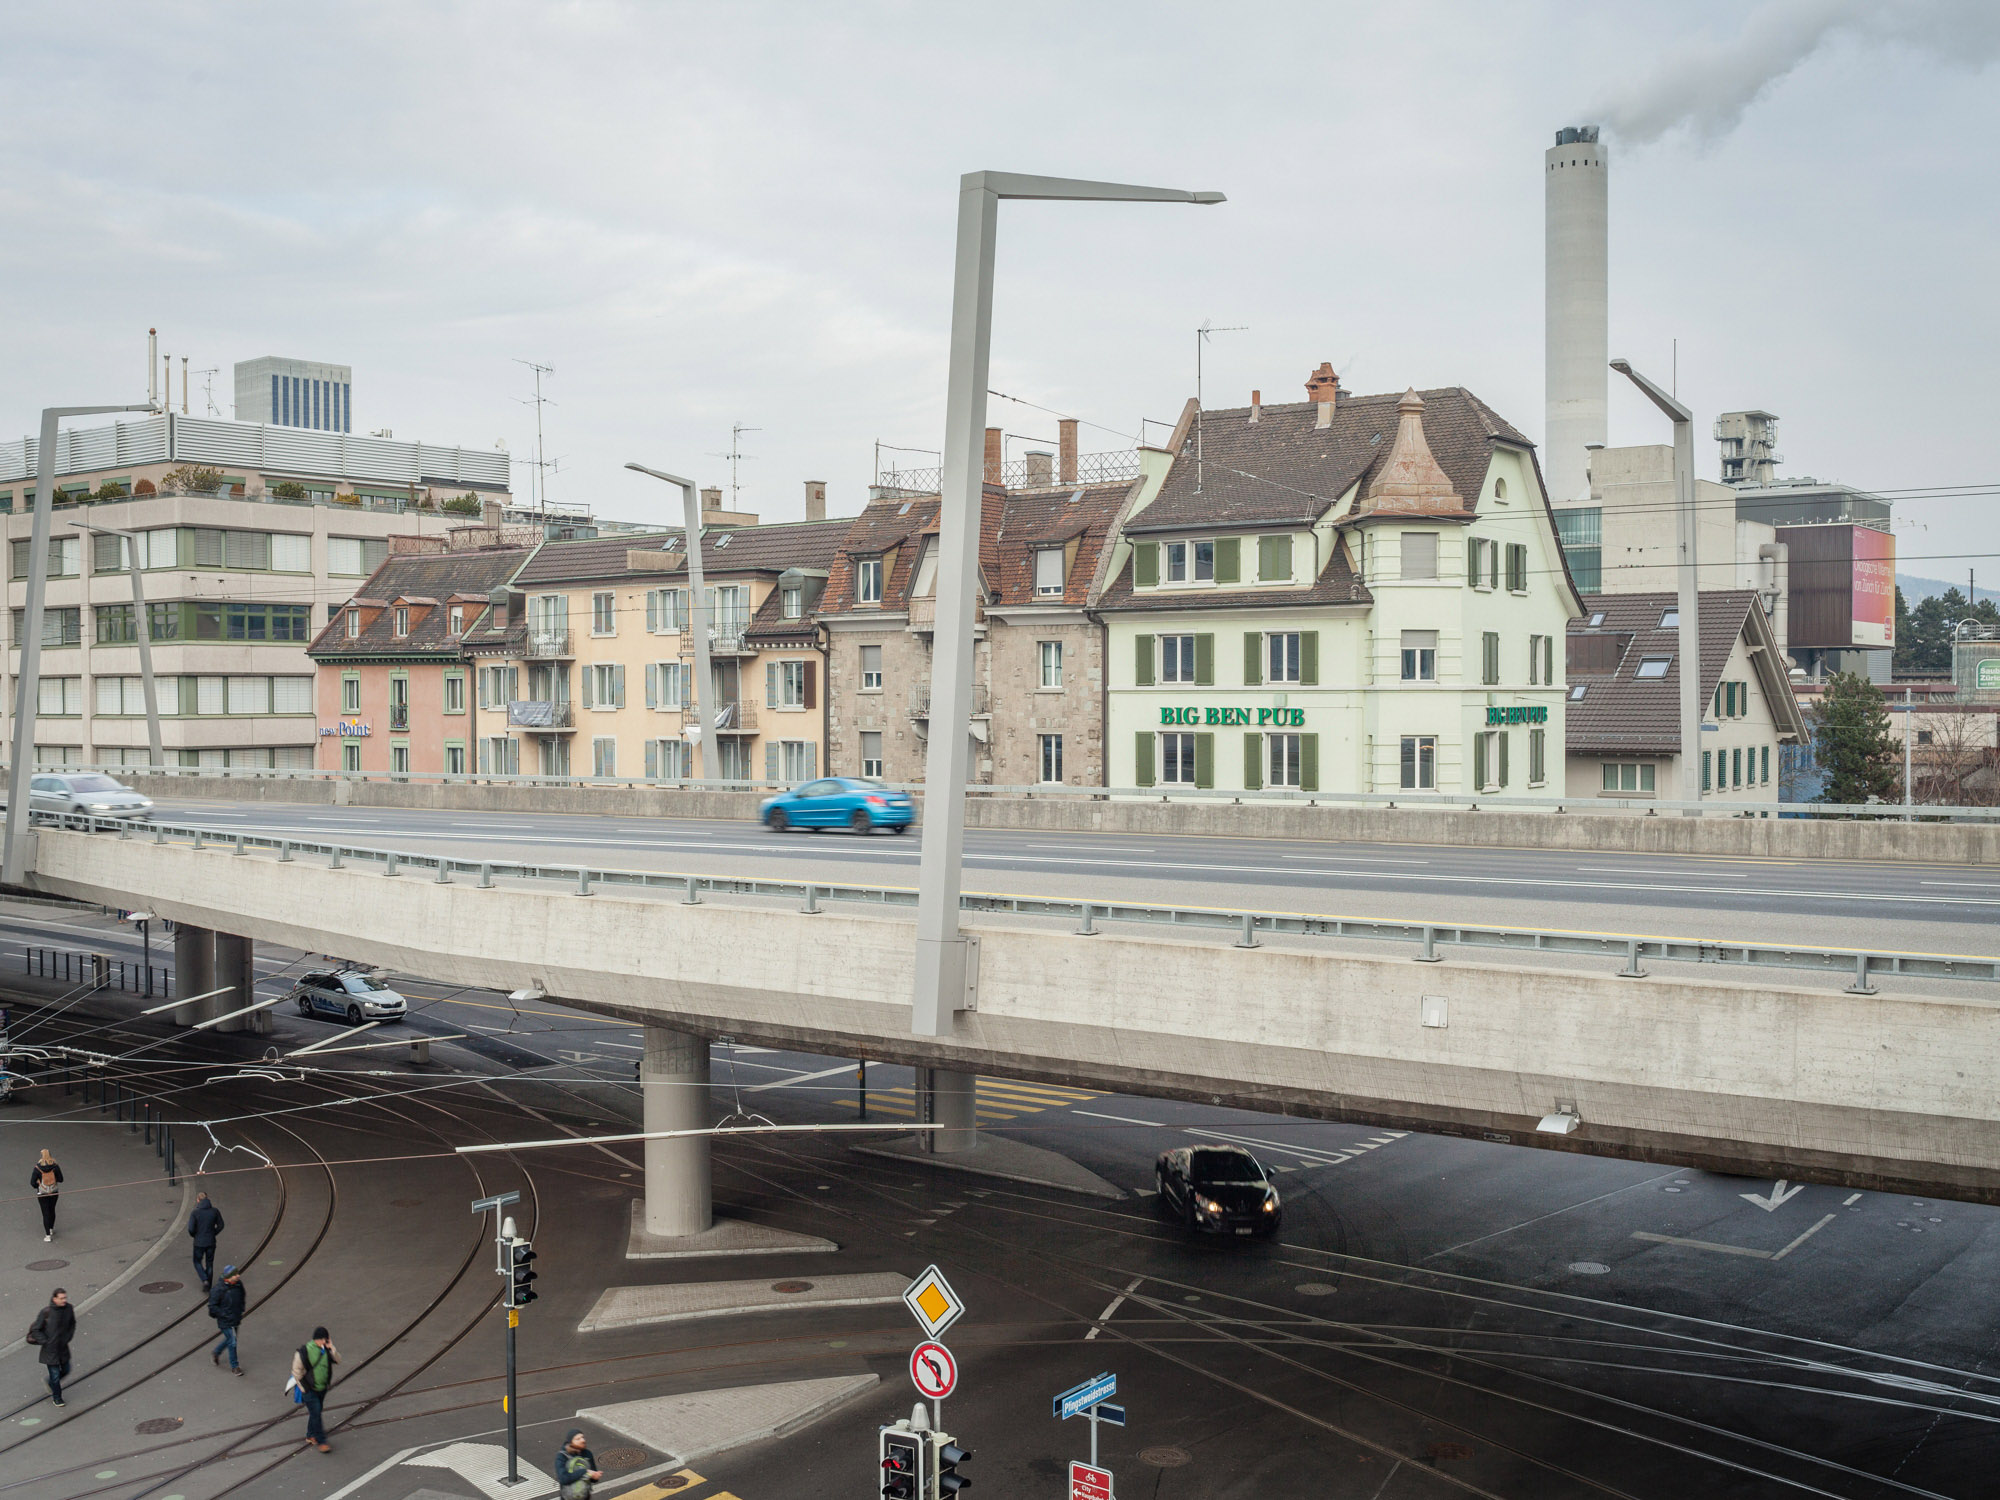 Zürich_Diary-0786-Pano.jpg